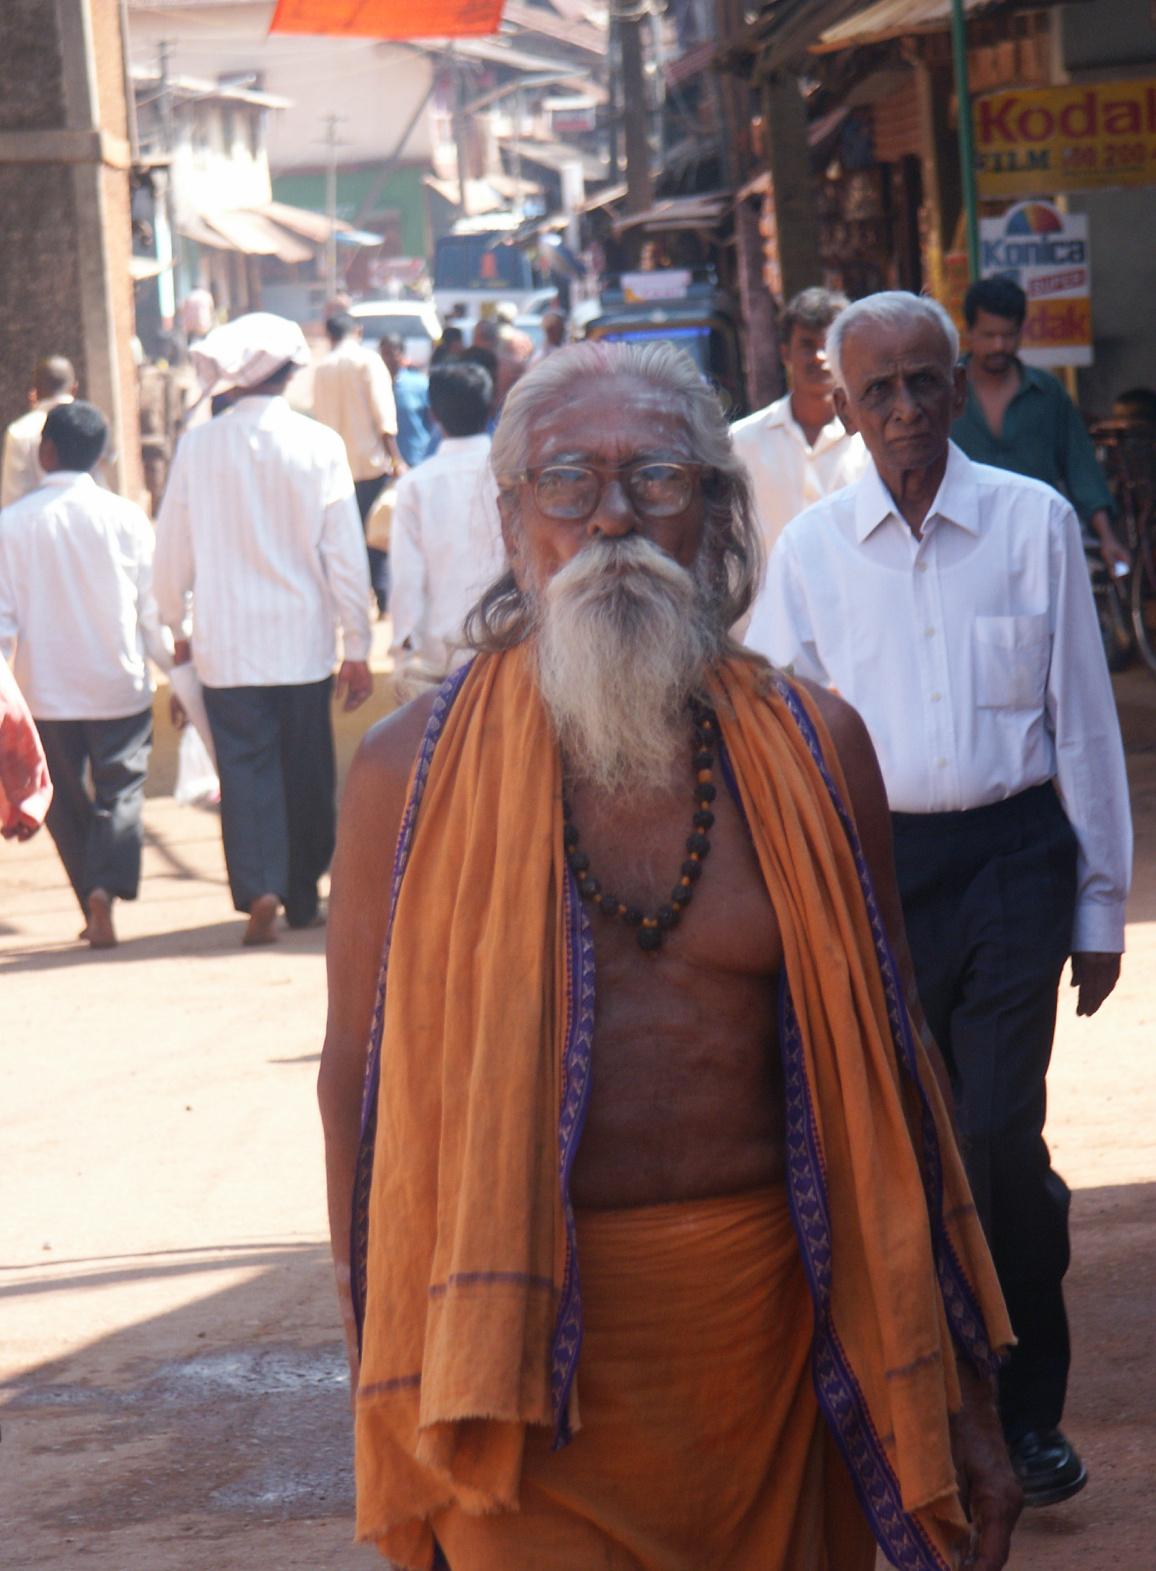 India street scene 1